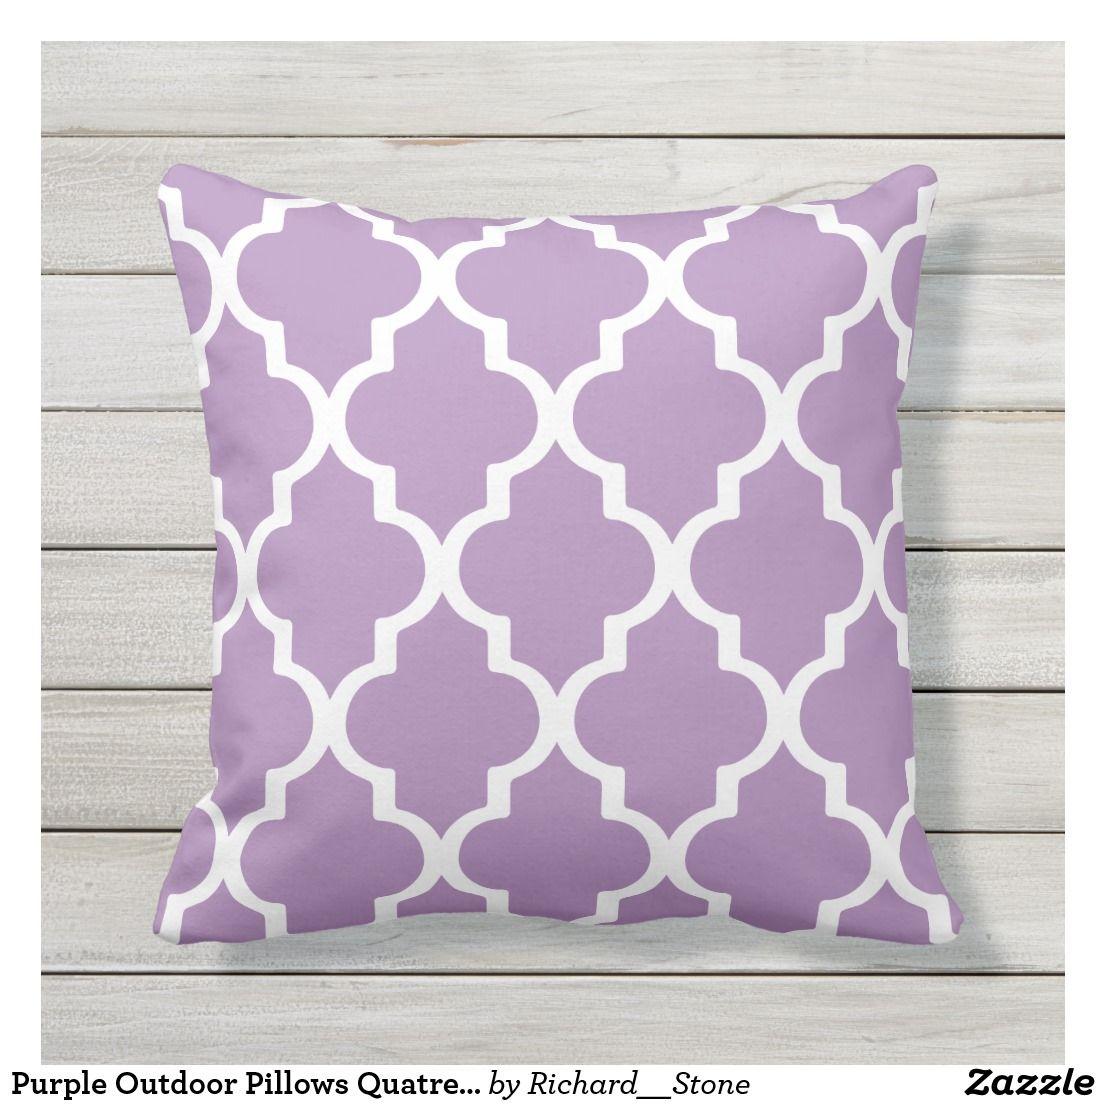 Purple Outdoor Pillows Quatrefoil Lattice Zazzle Com Outdoor